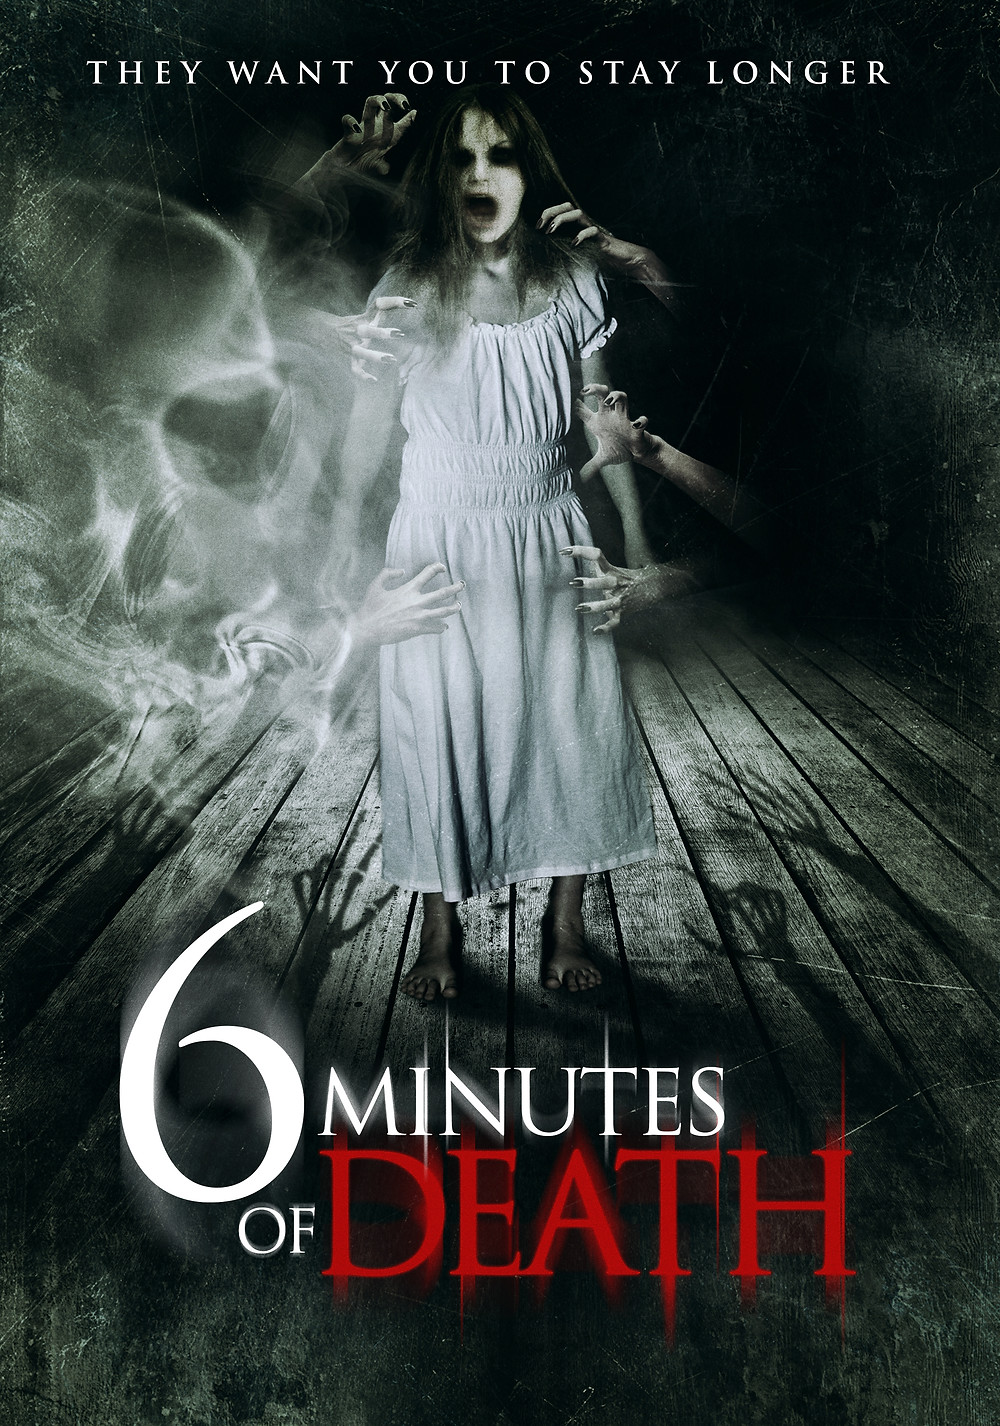 6_MINUTES_DVD_SLV hi-res.jpg